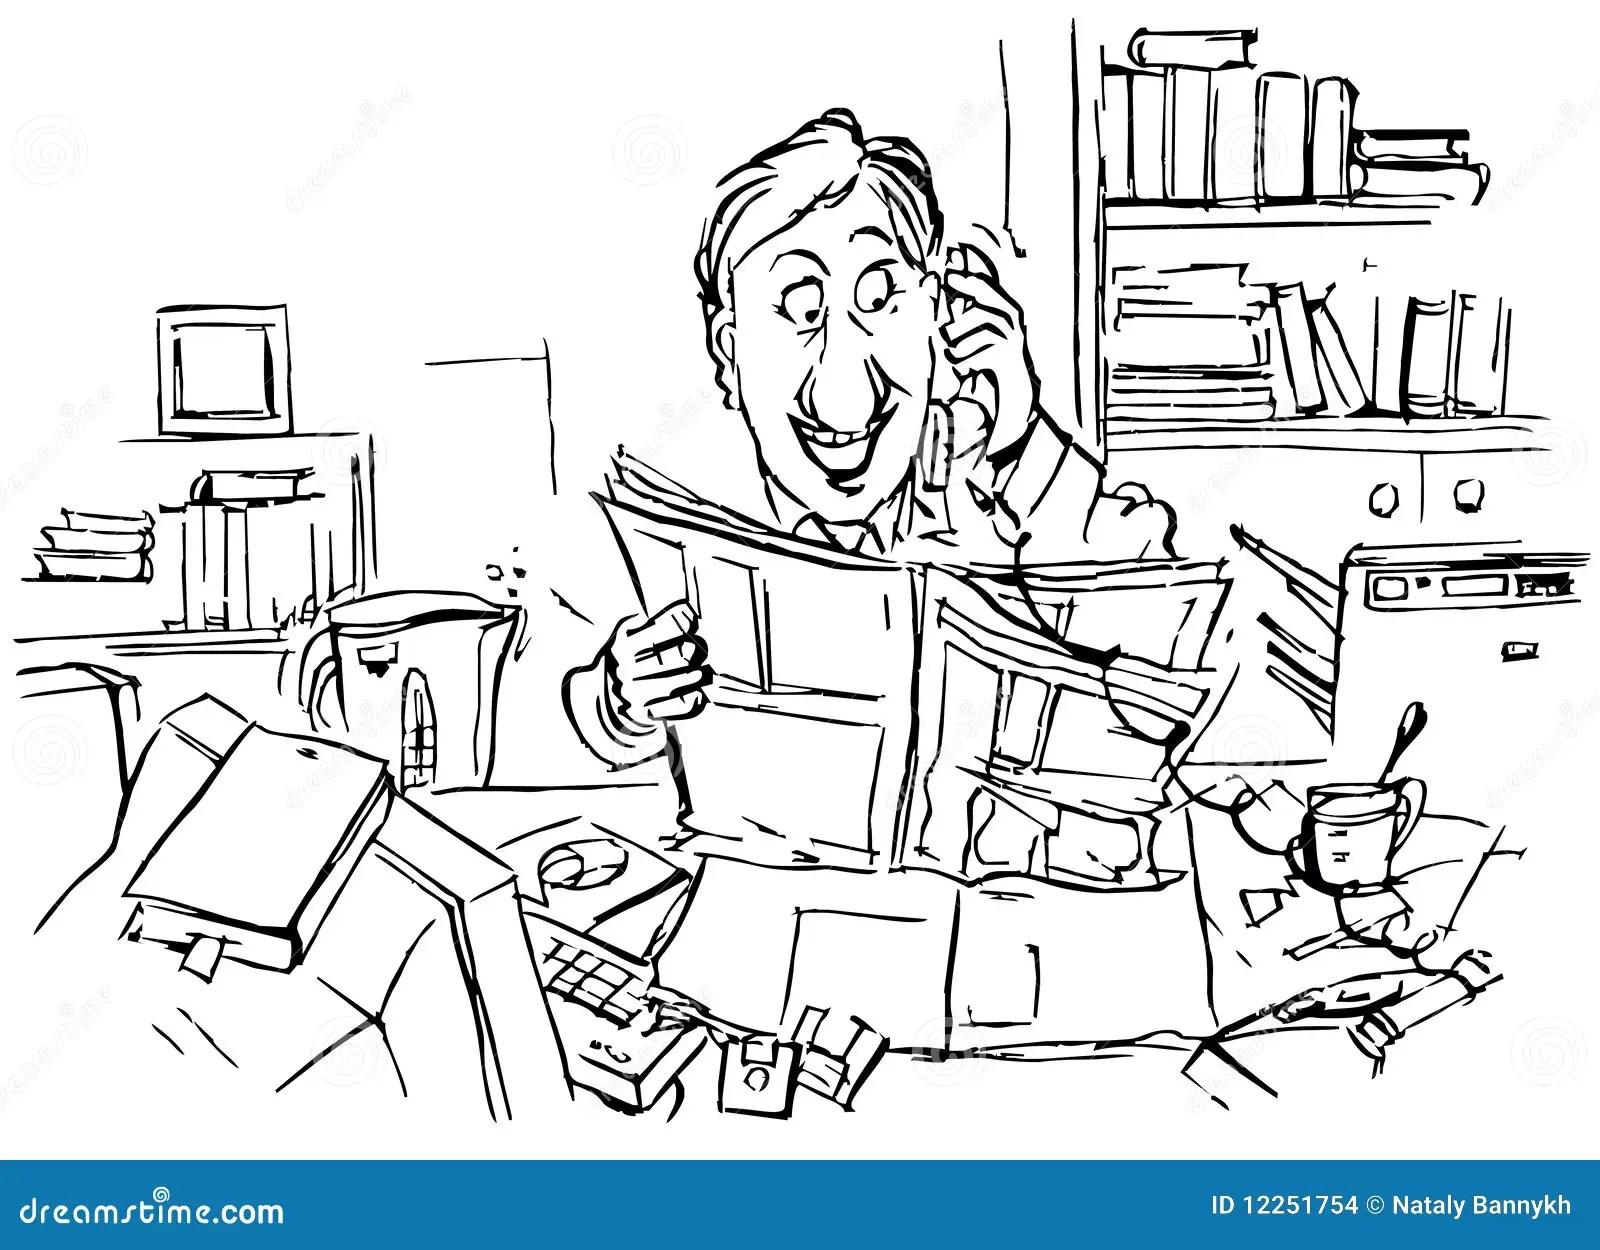 Office Worker Speaks On The Telephone Stock Illustration